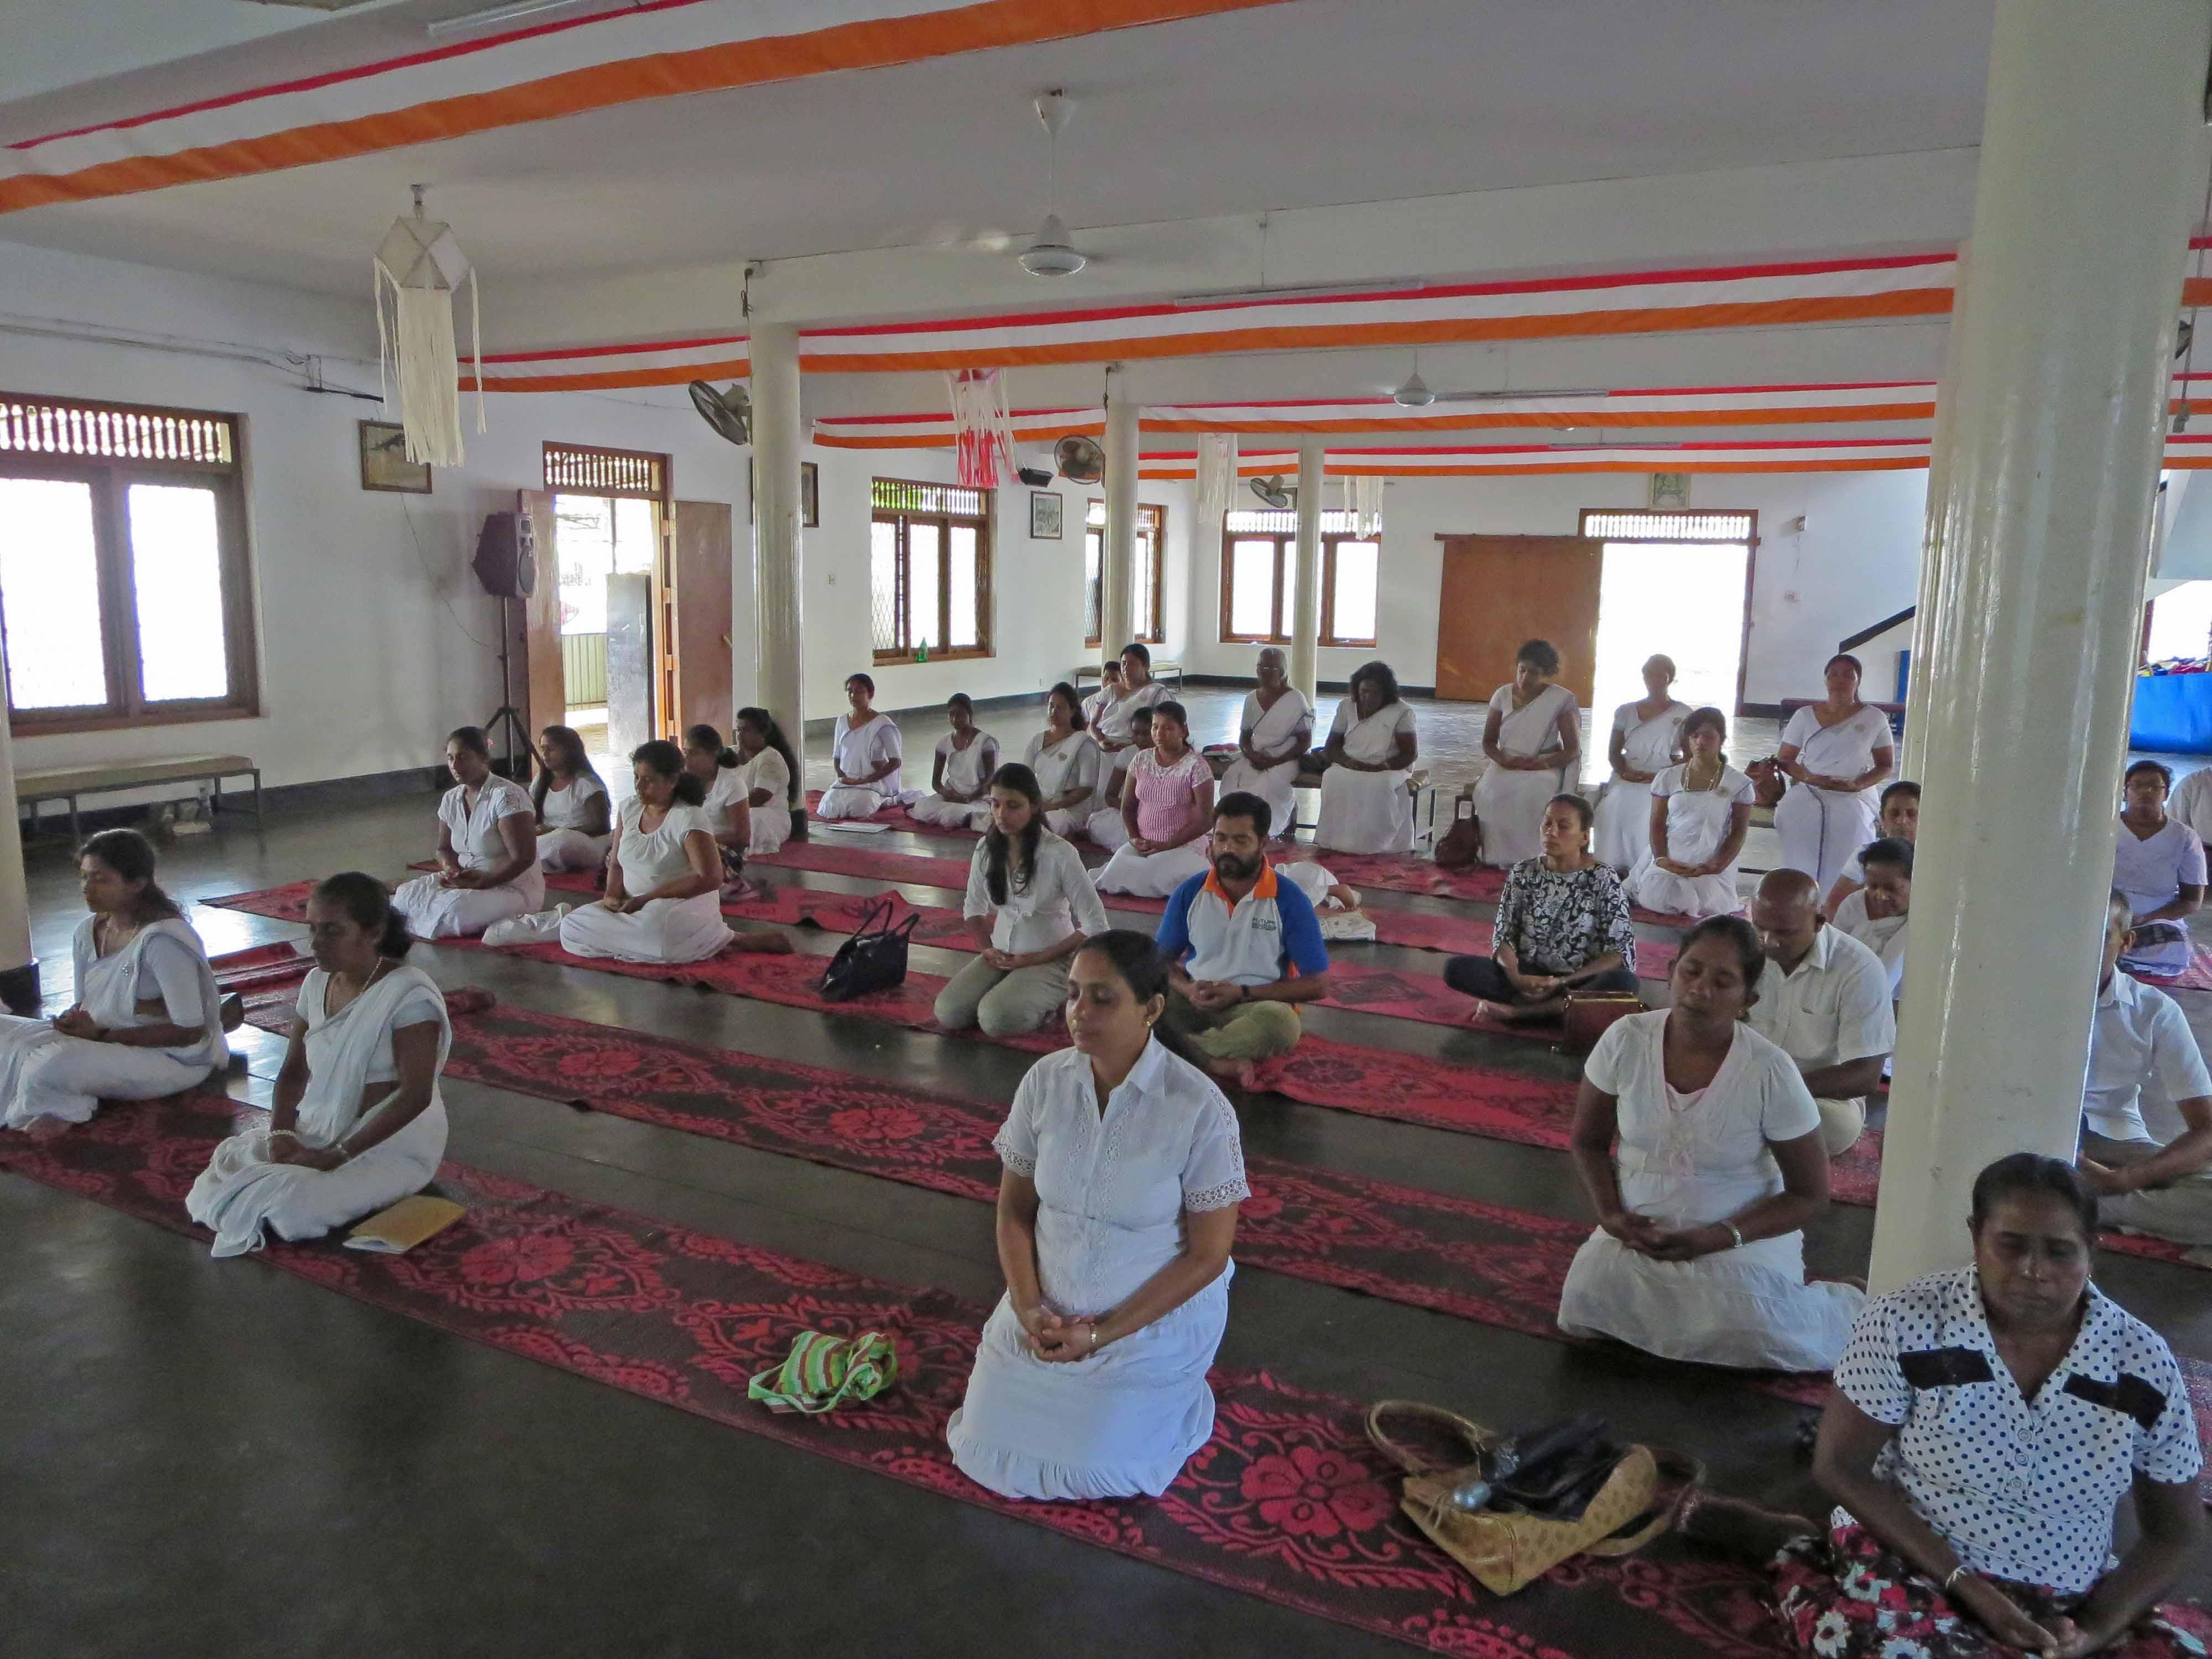 'Sati Daham Pasala' program at Hendala Rajamaha Viharaya, Wattala